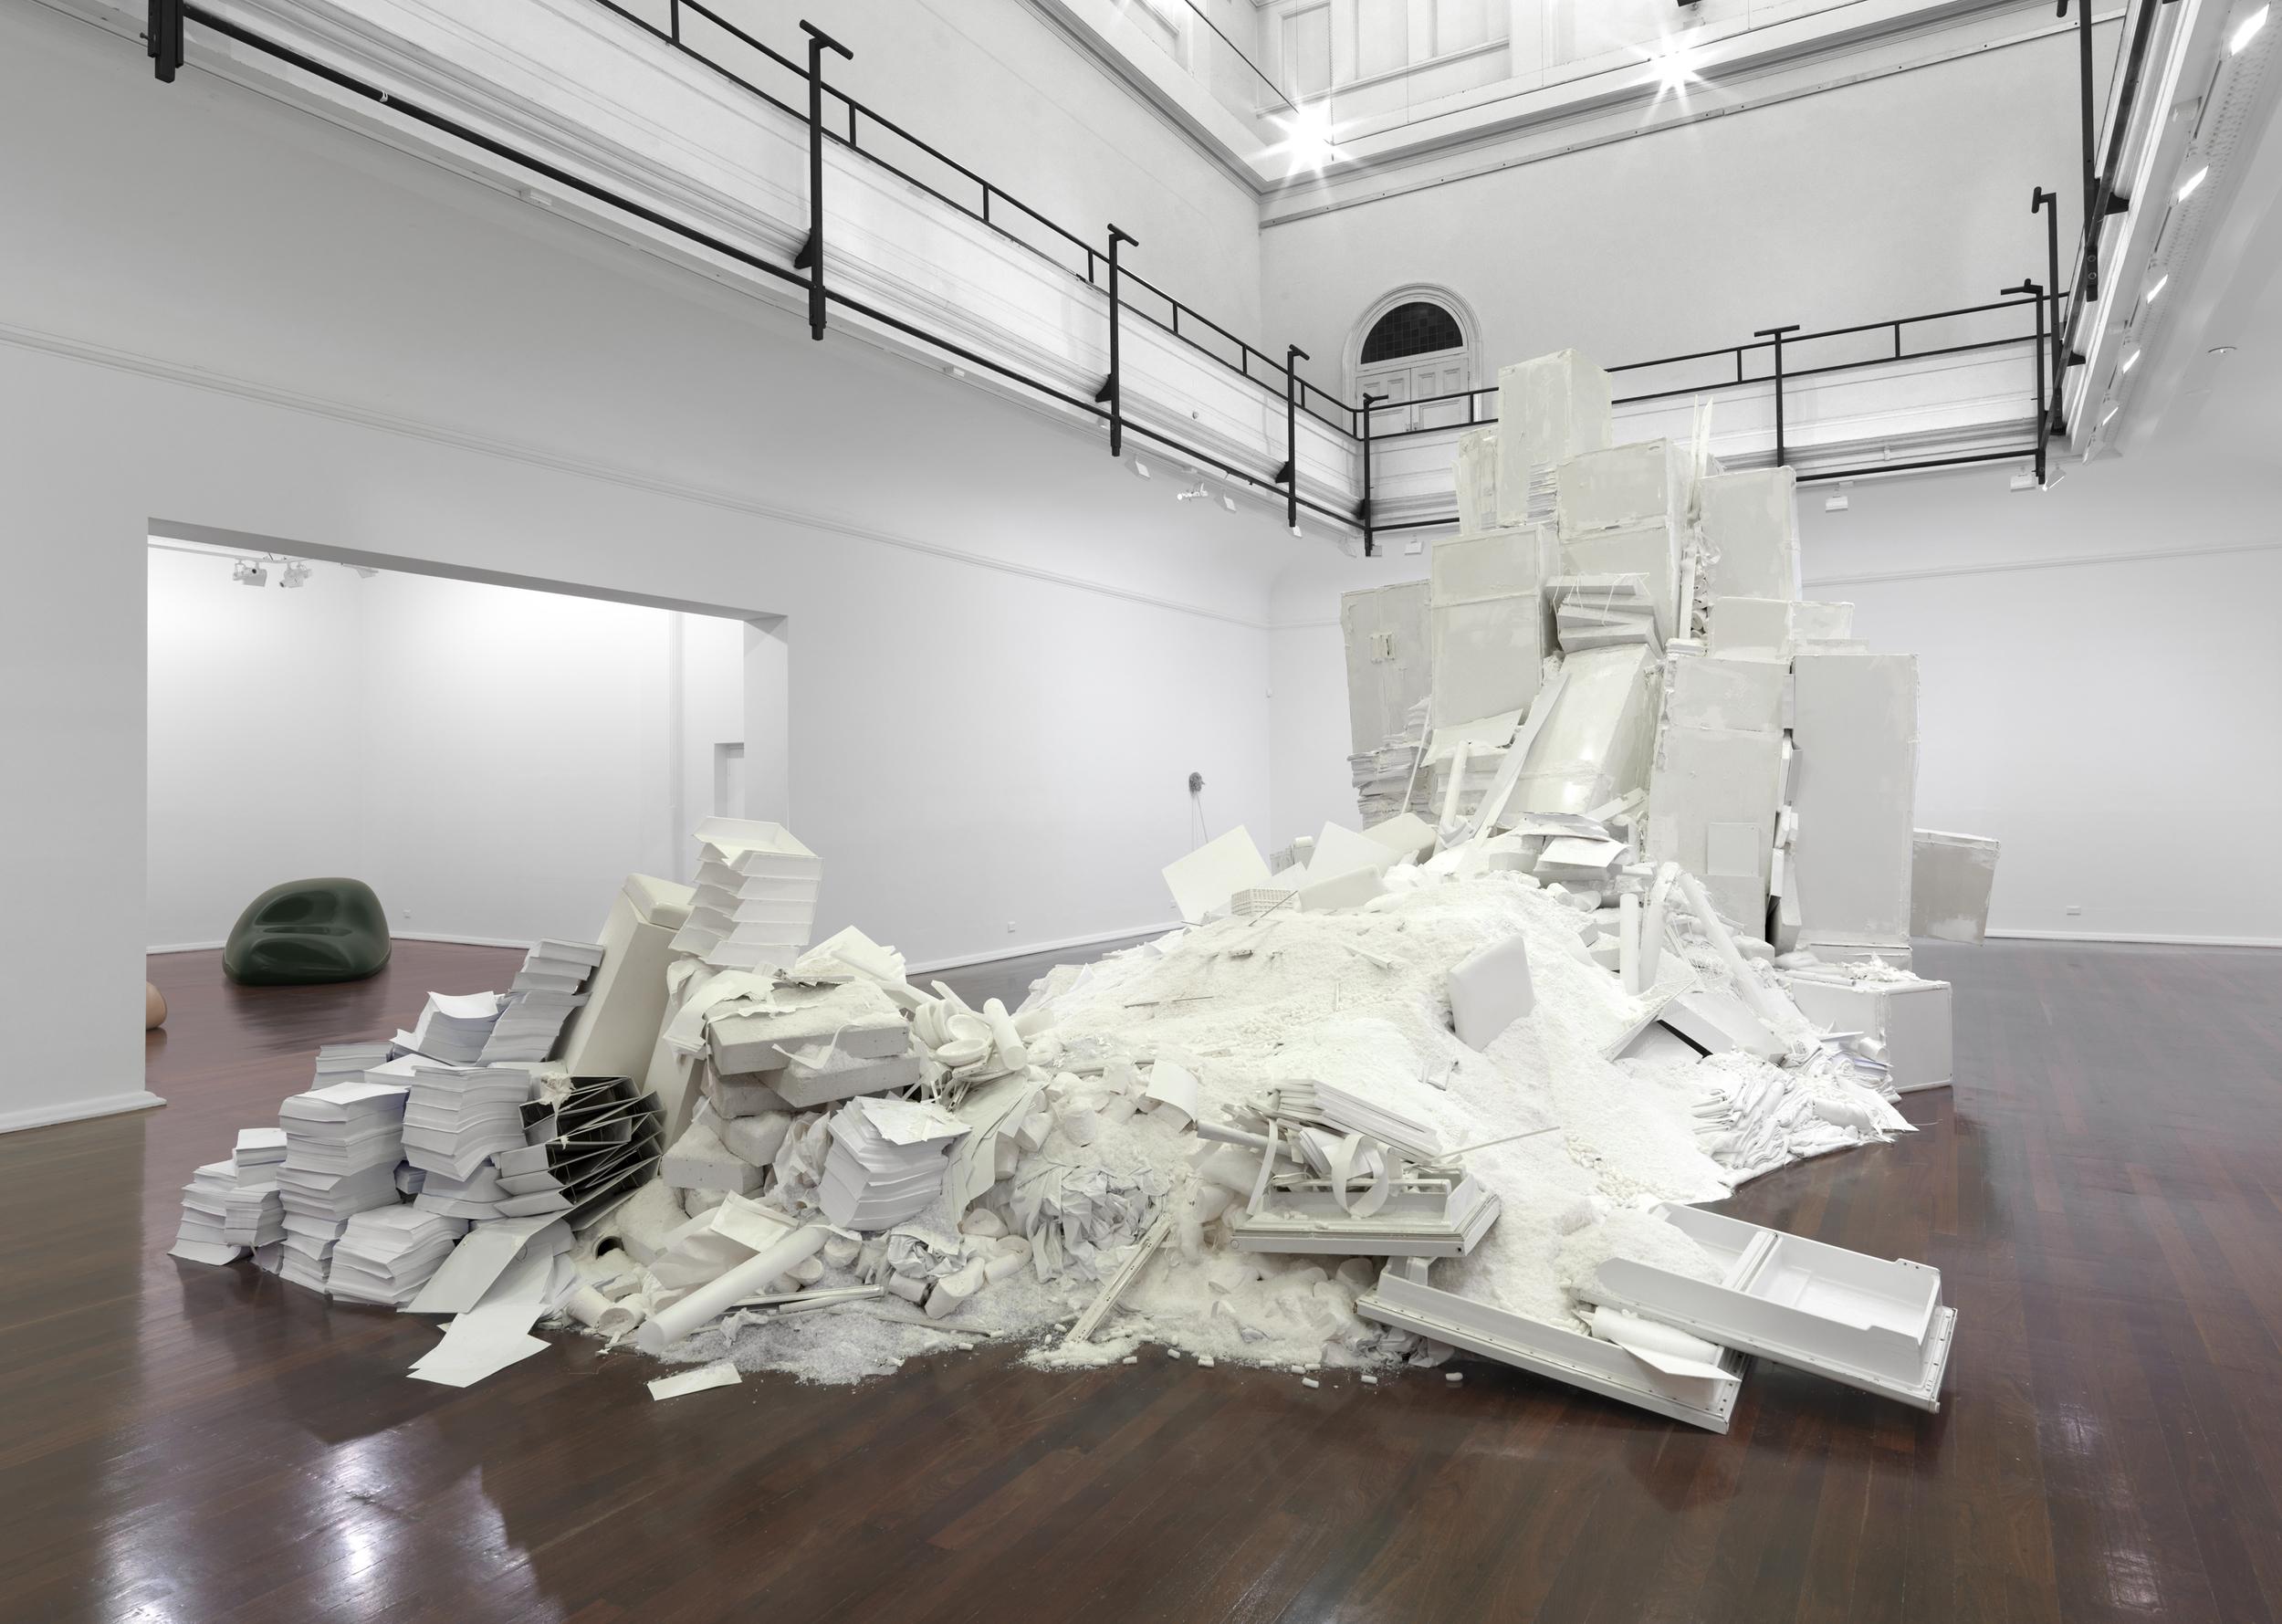 Muda (Perth version), 2012, various materials,approx. 500 x 1000 x 580 cm